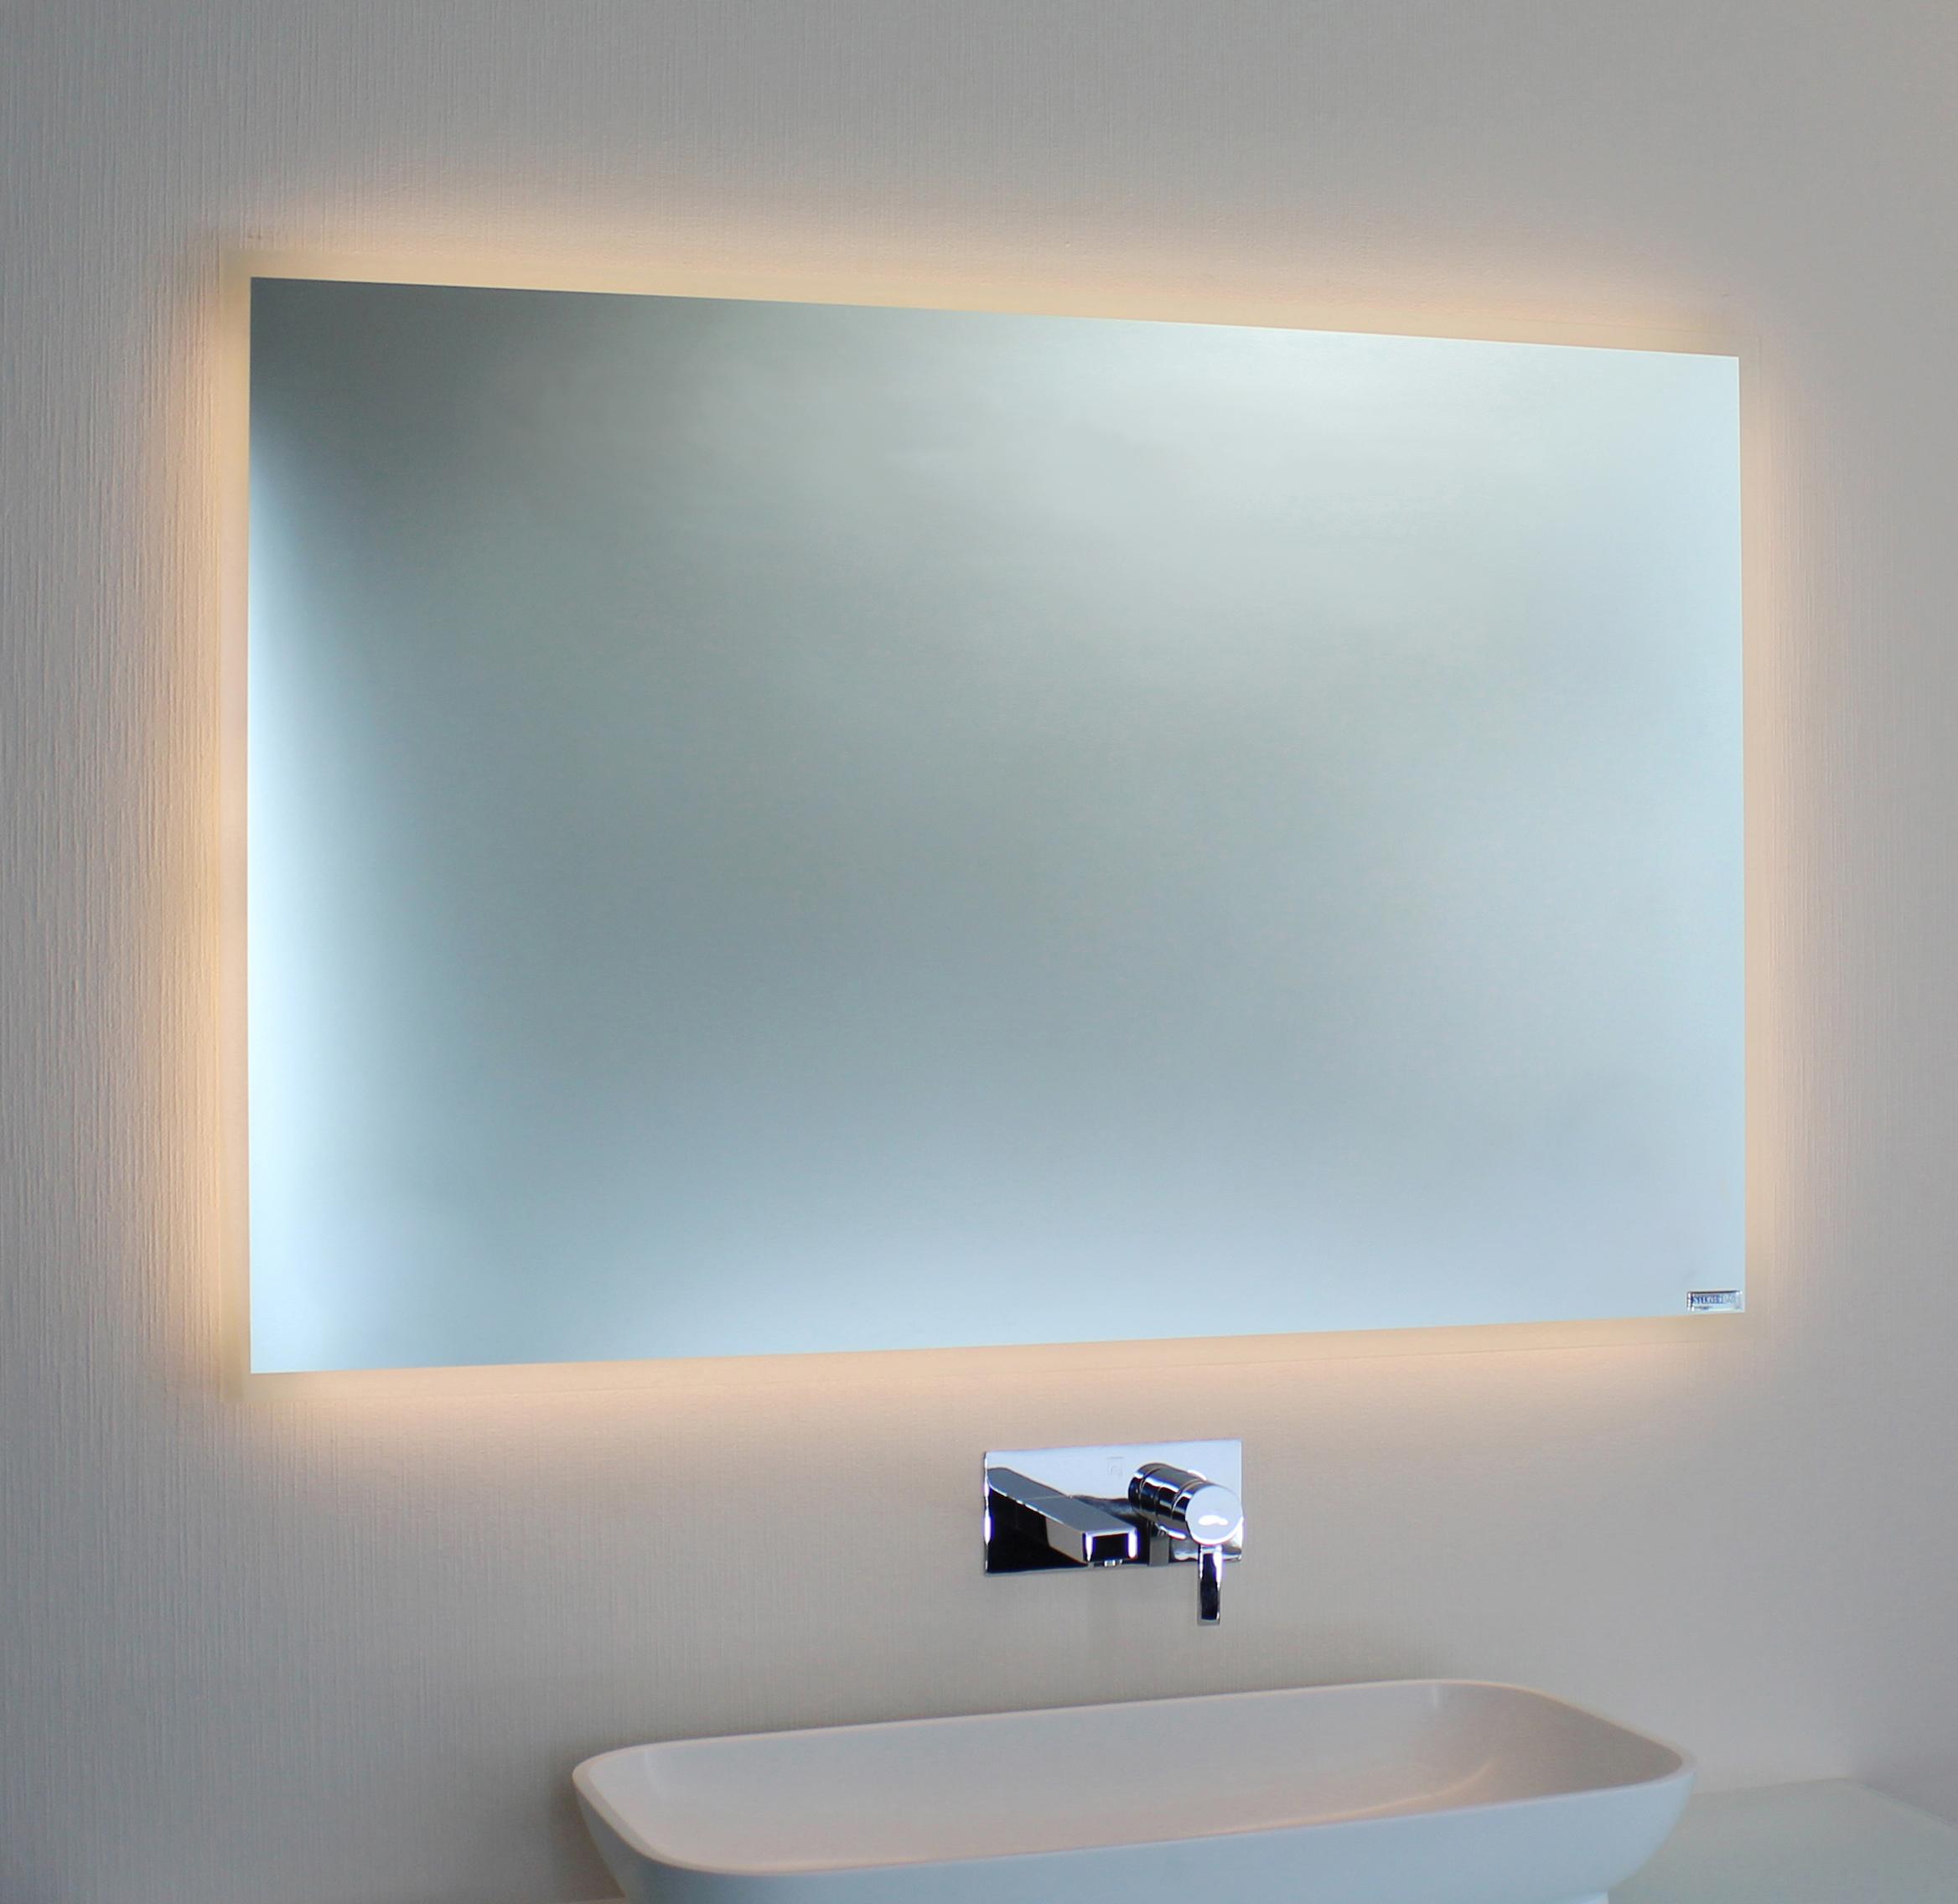 Berühmt Badspiegel LED Ambientebel. 00-04 » SPIEGEL ART® UW02